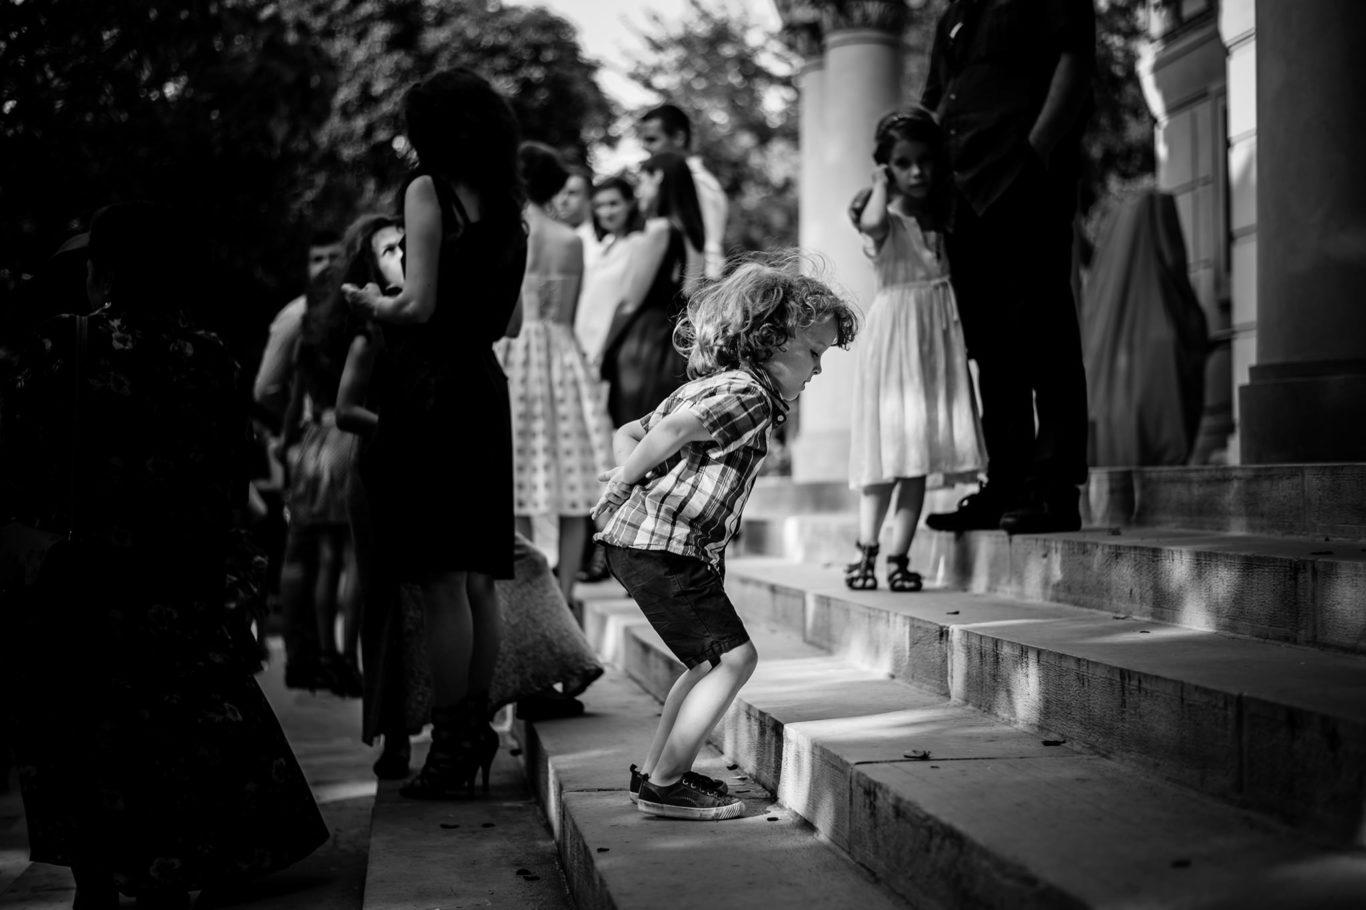 0462-fotografie-nunta-bucuresti-rodica-rares-fotograf-ciprian-dumitrescu-dsc_2773